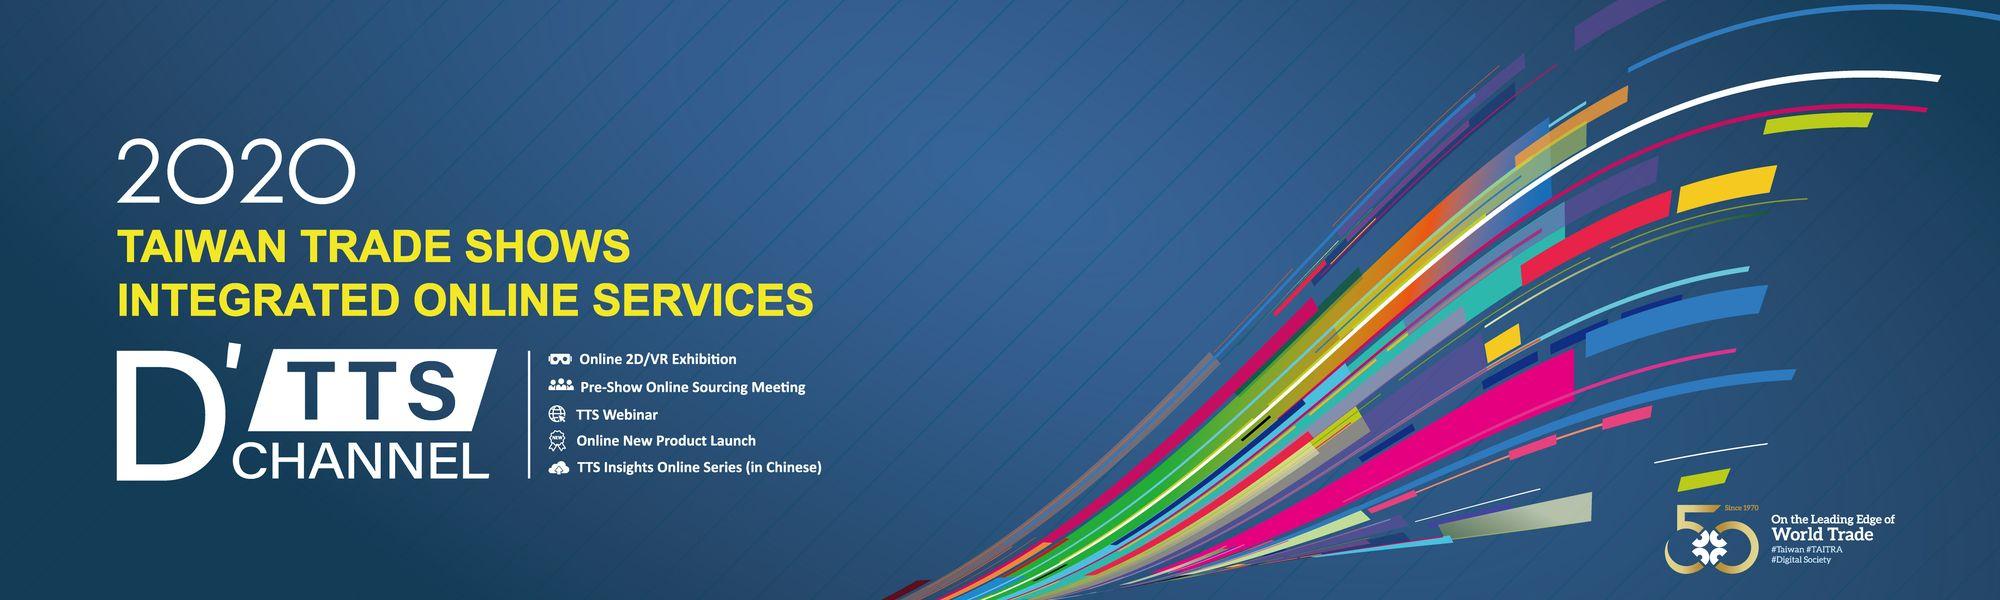 Online Services Program